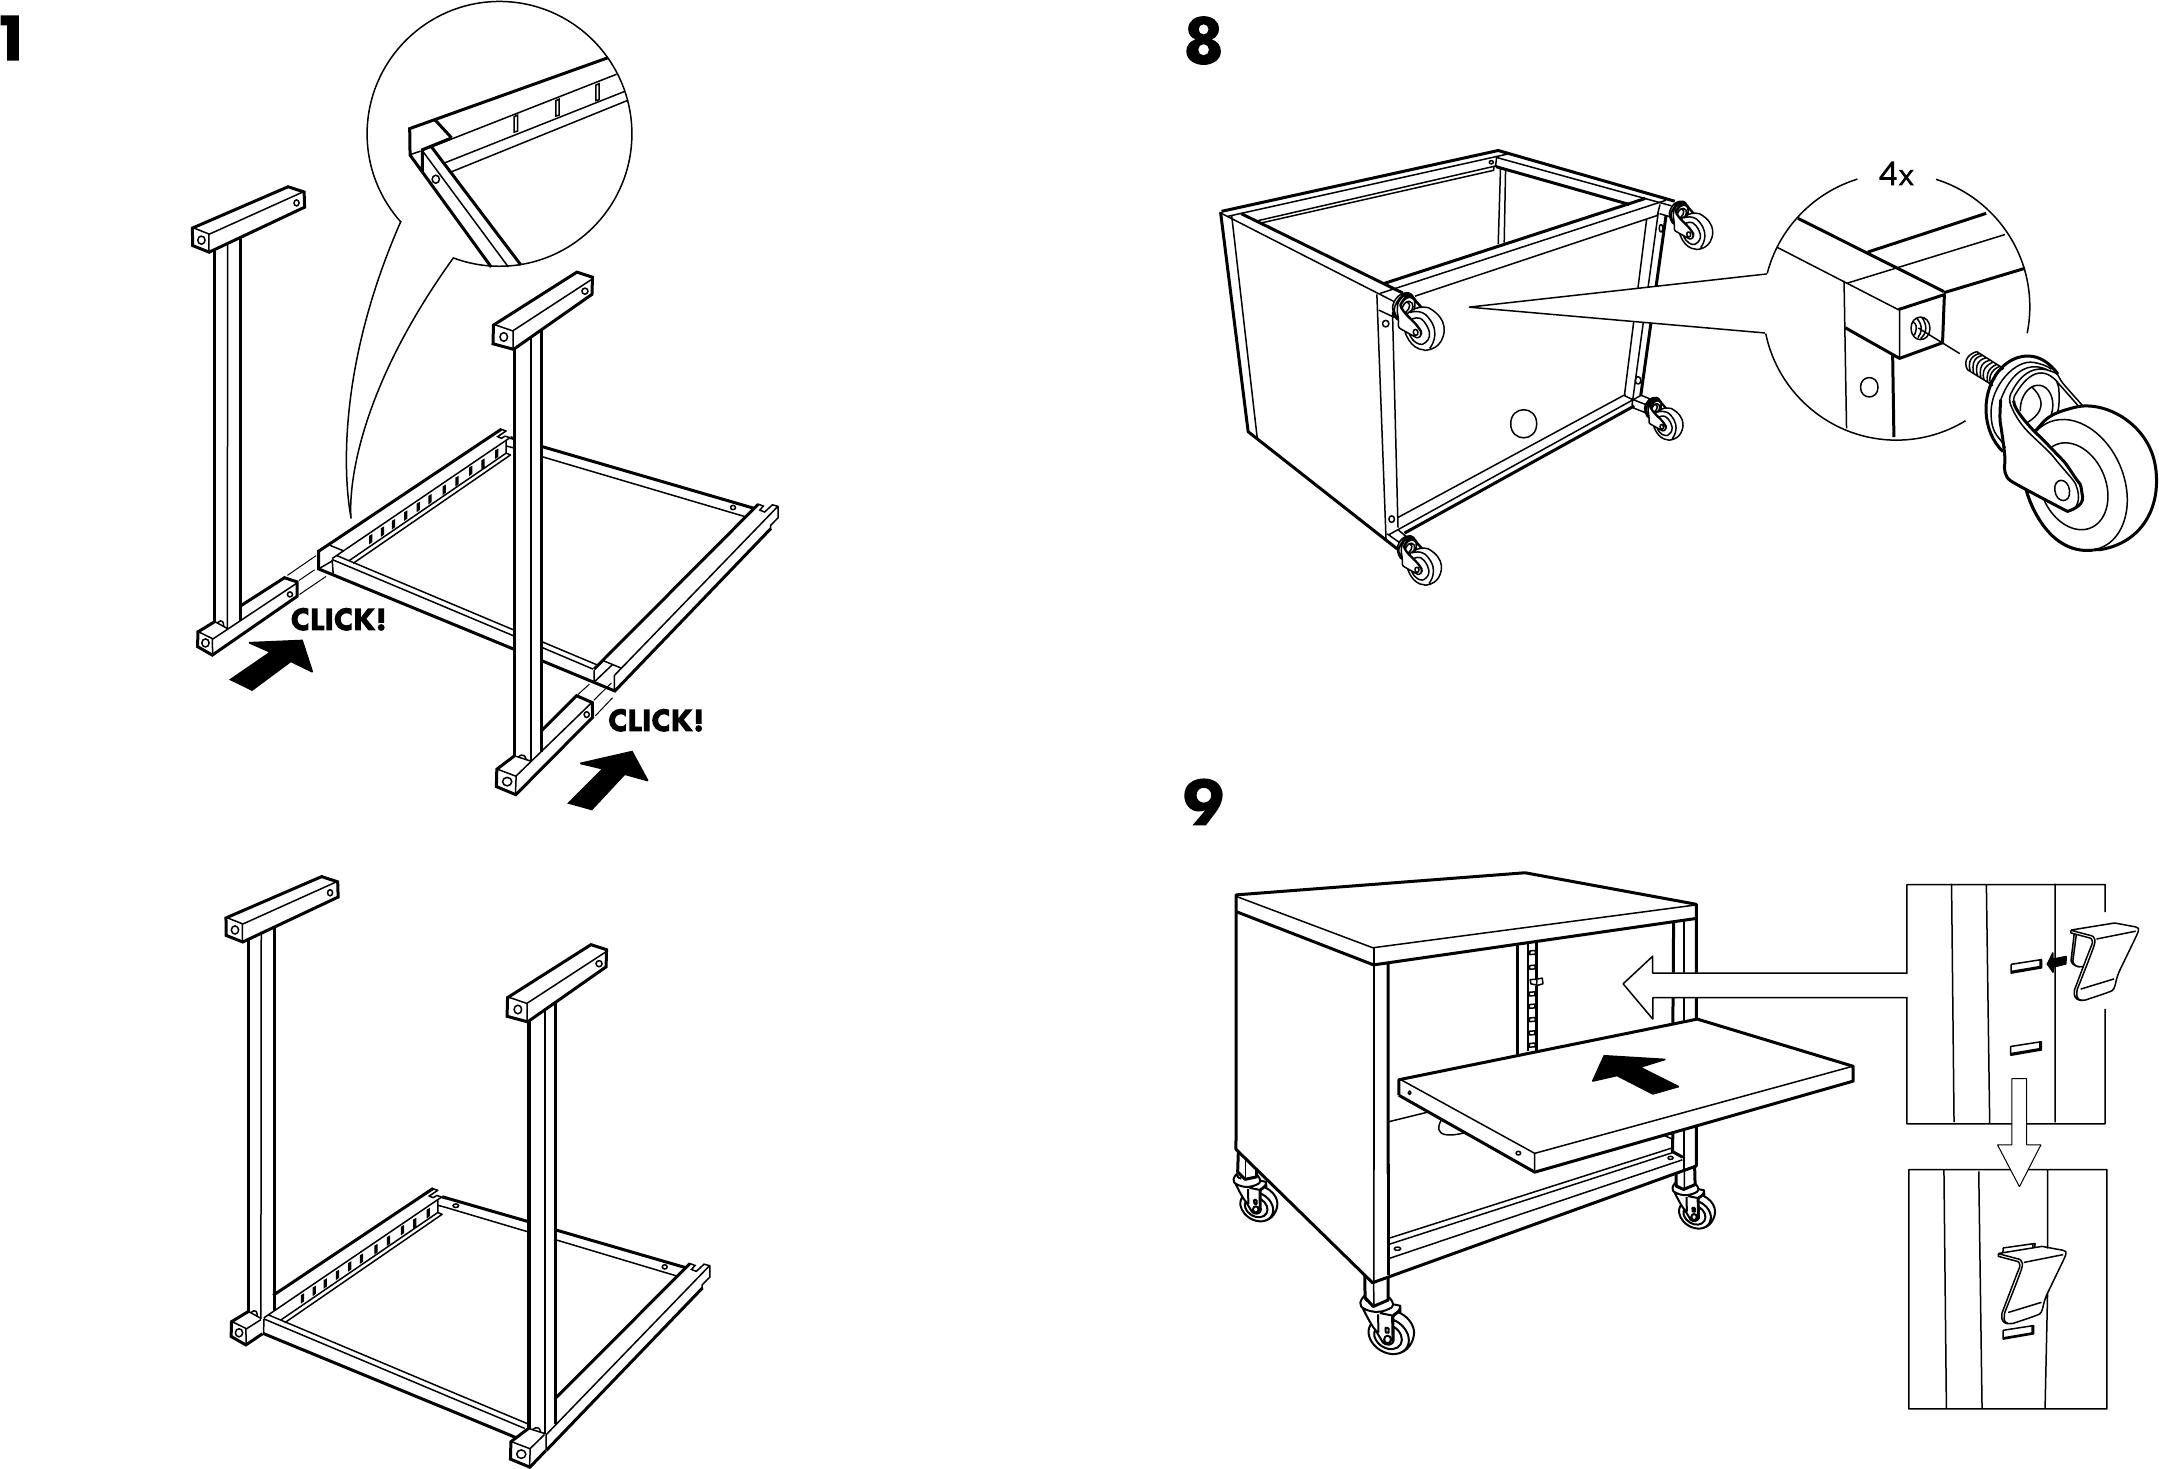 Aspelund Ikea Kast Handleiding ~ Handleiding Ikea PS kast op wielen (pagina 4 van 6) (Dansk, Deutsch